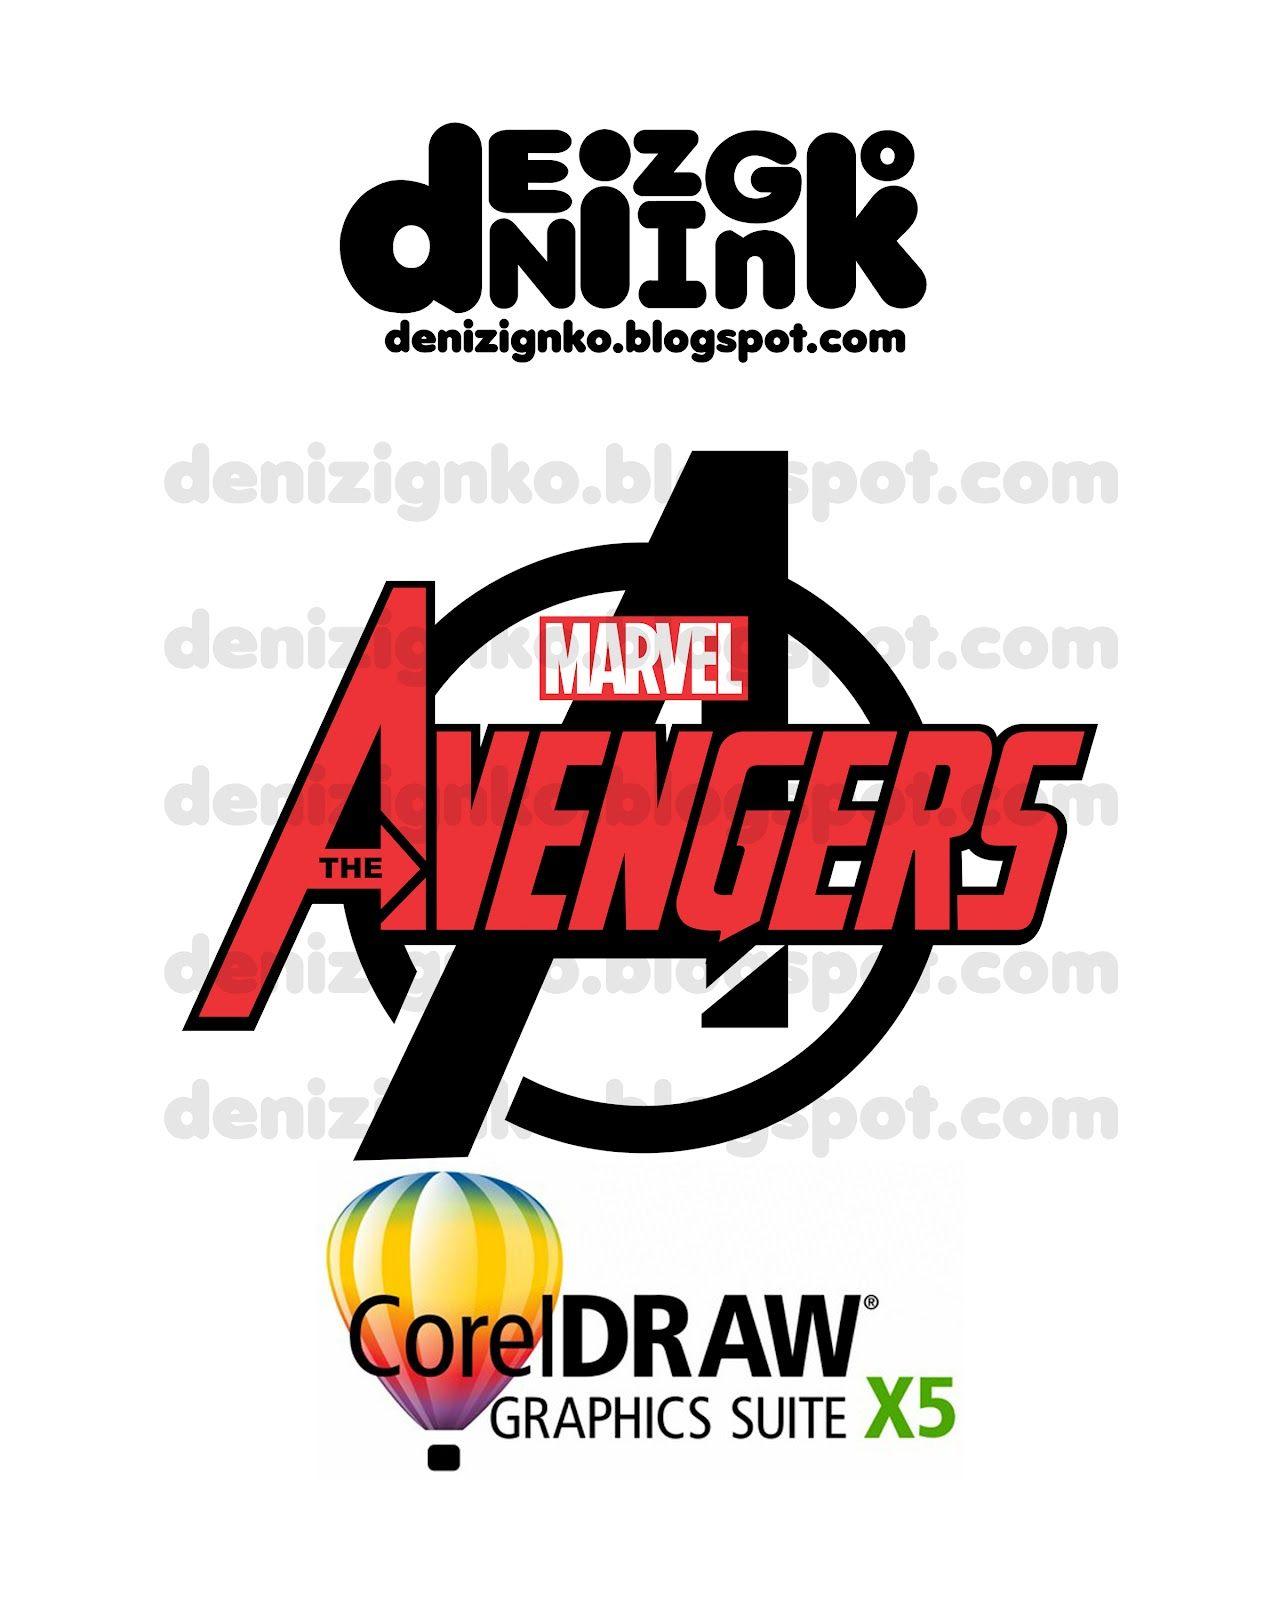 The Avengers Logo Vector Free Download Avengers logo